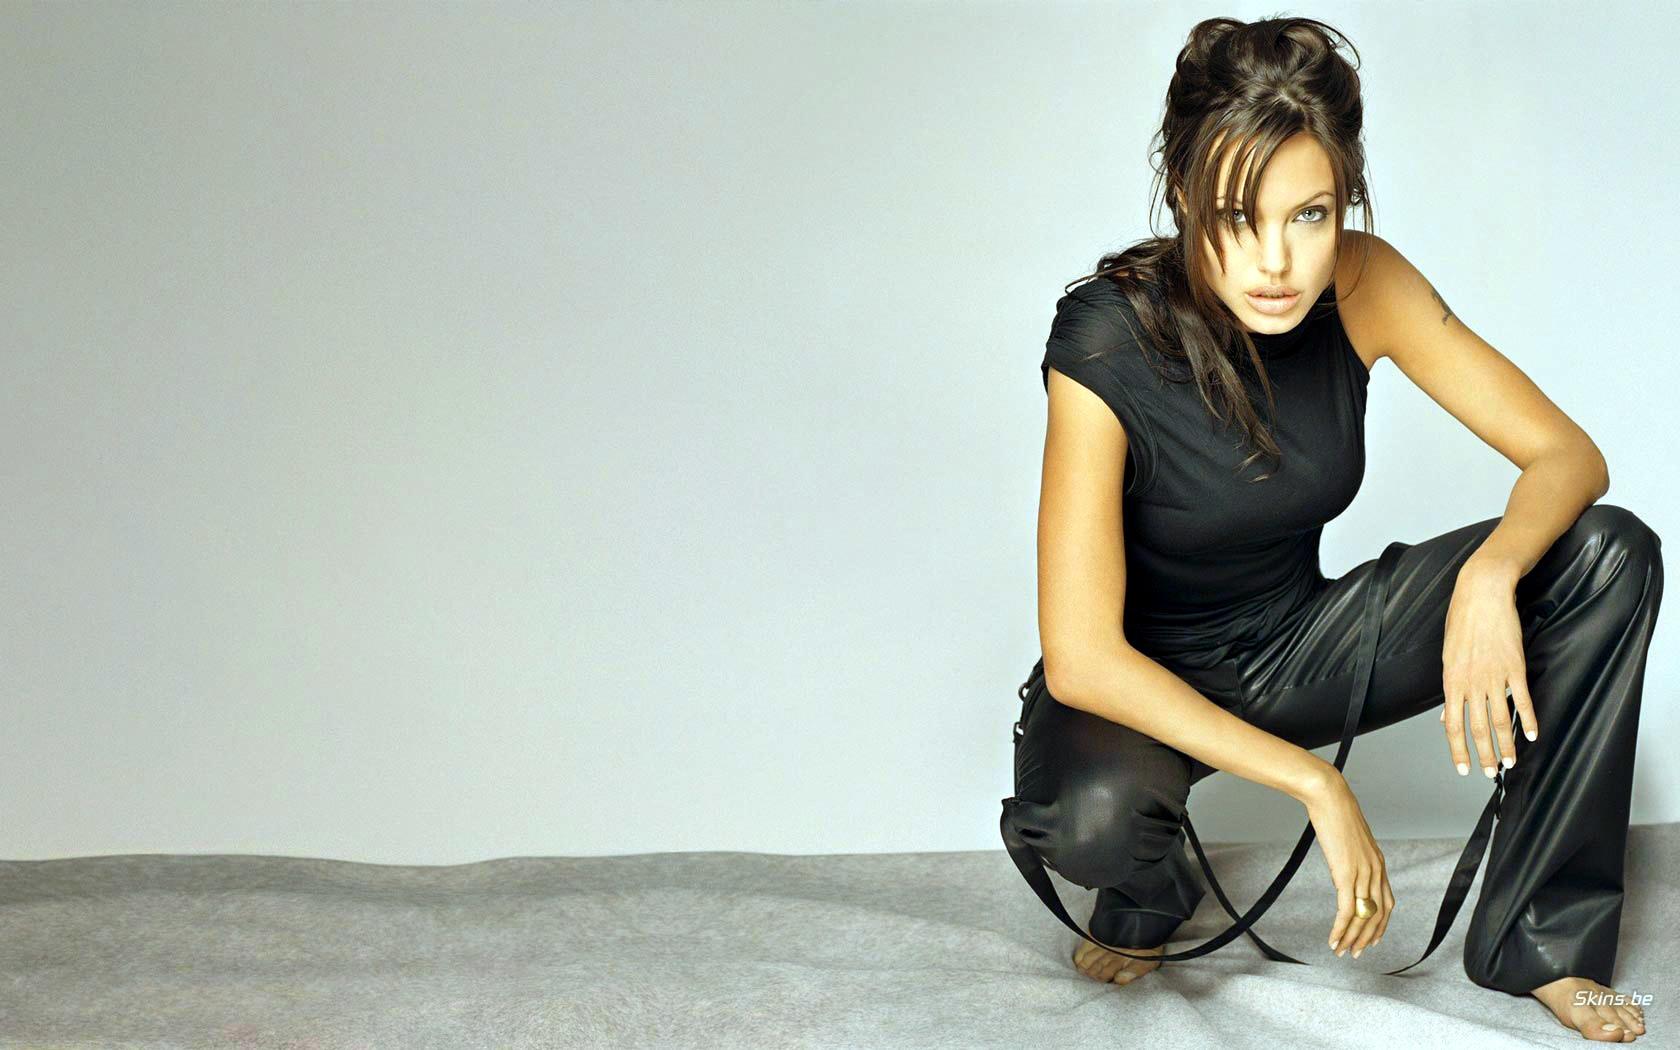 Red Dead Redemption Wallpaper Hd Fondos De Pantalla De Angelina Jolie Wallpapers Hd Gratis